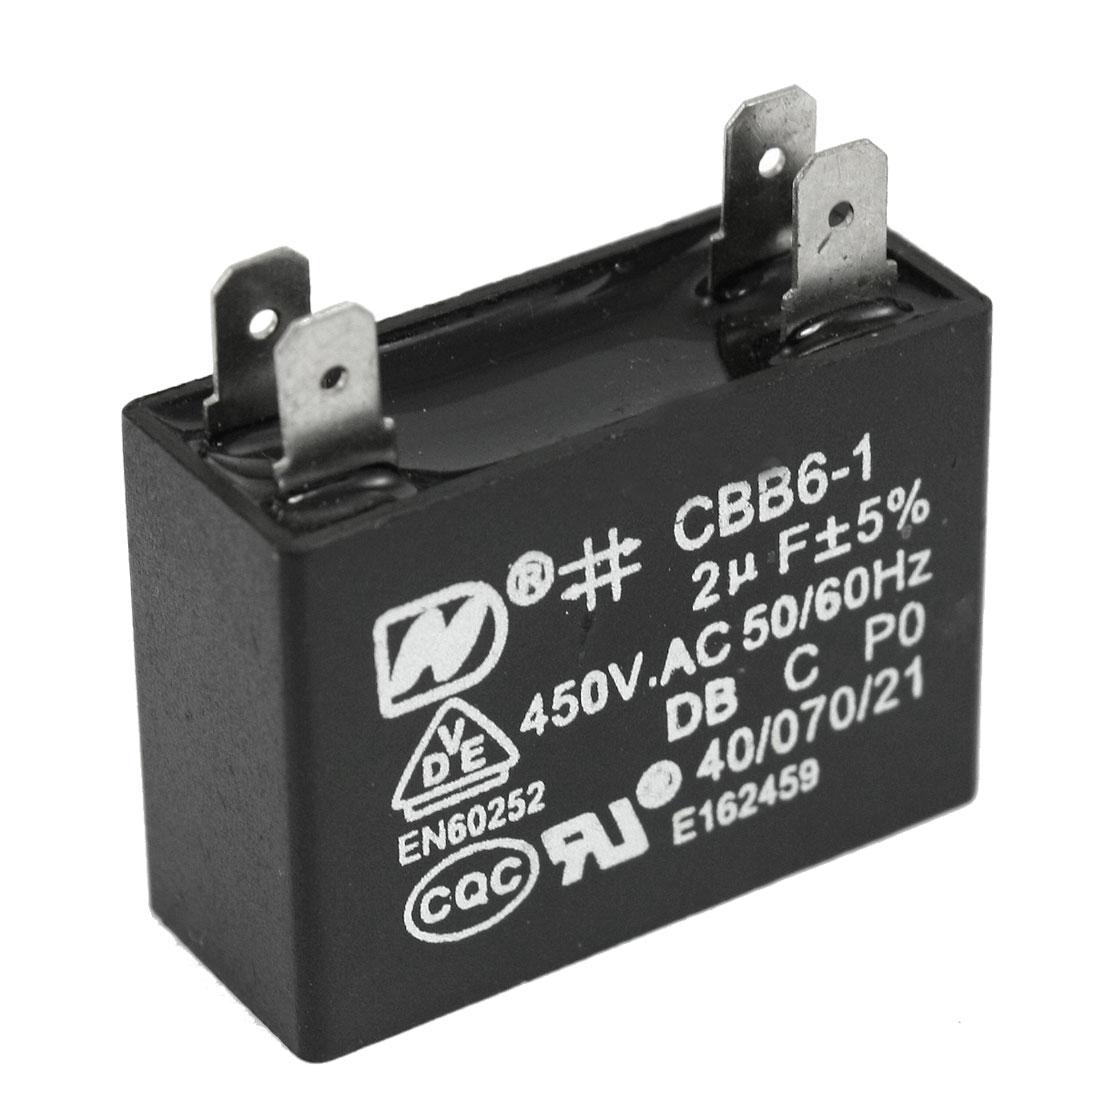 Ceiling Fan 2uF CBB6-1 450VAC Polypropylene Film Motor Capacitor